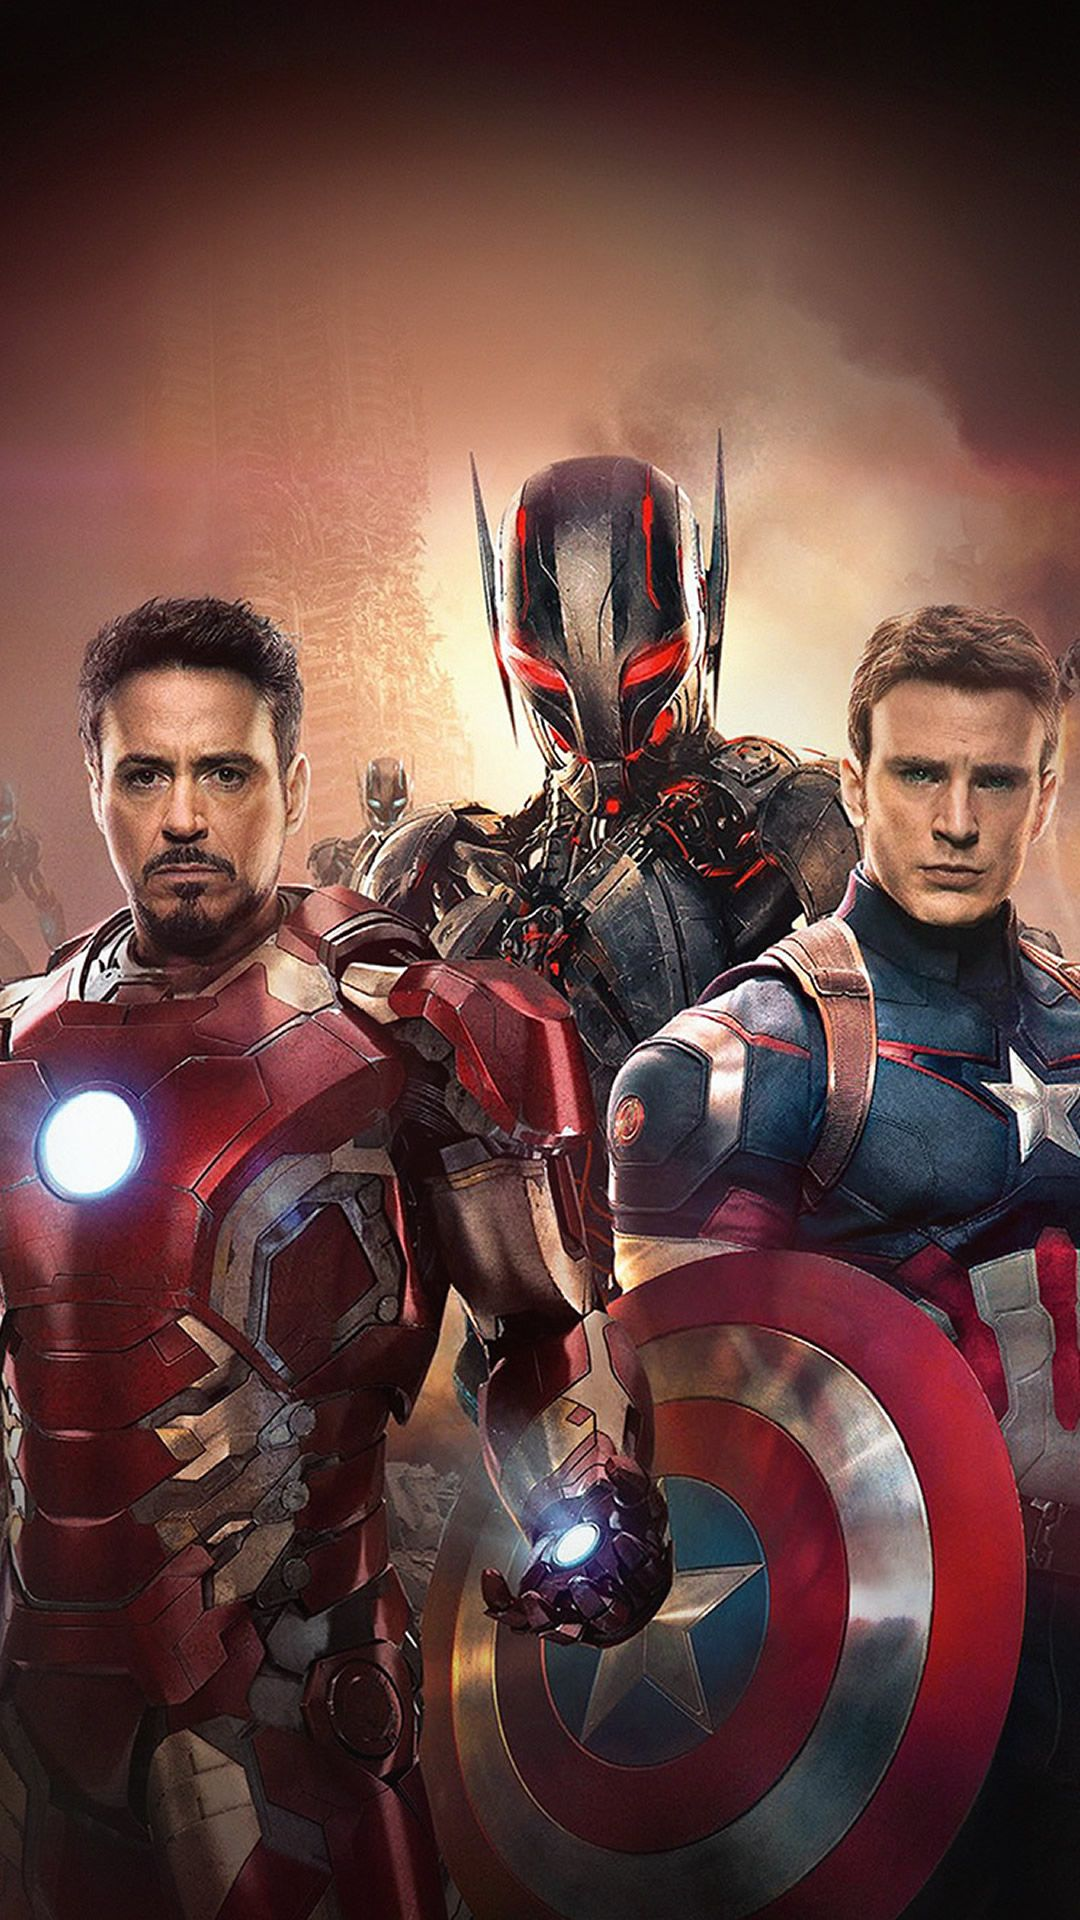 Wallpaper iphone 6 xman - Avengers Poster Age Of Ultron Art Film Iphone 7 Wallpaper